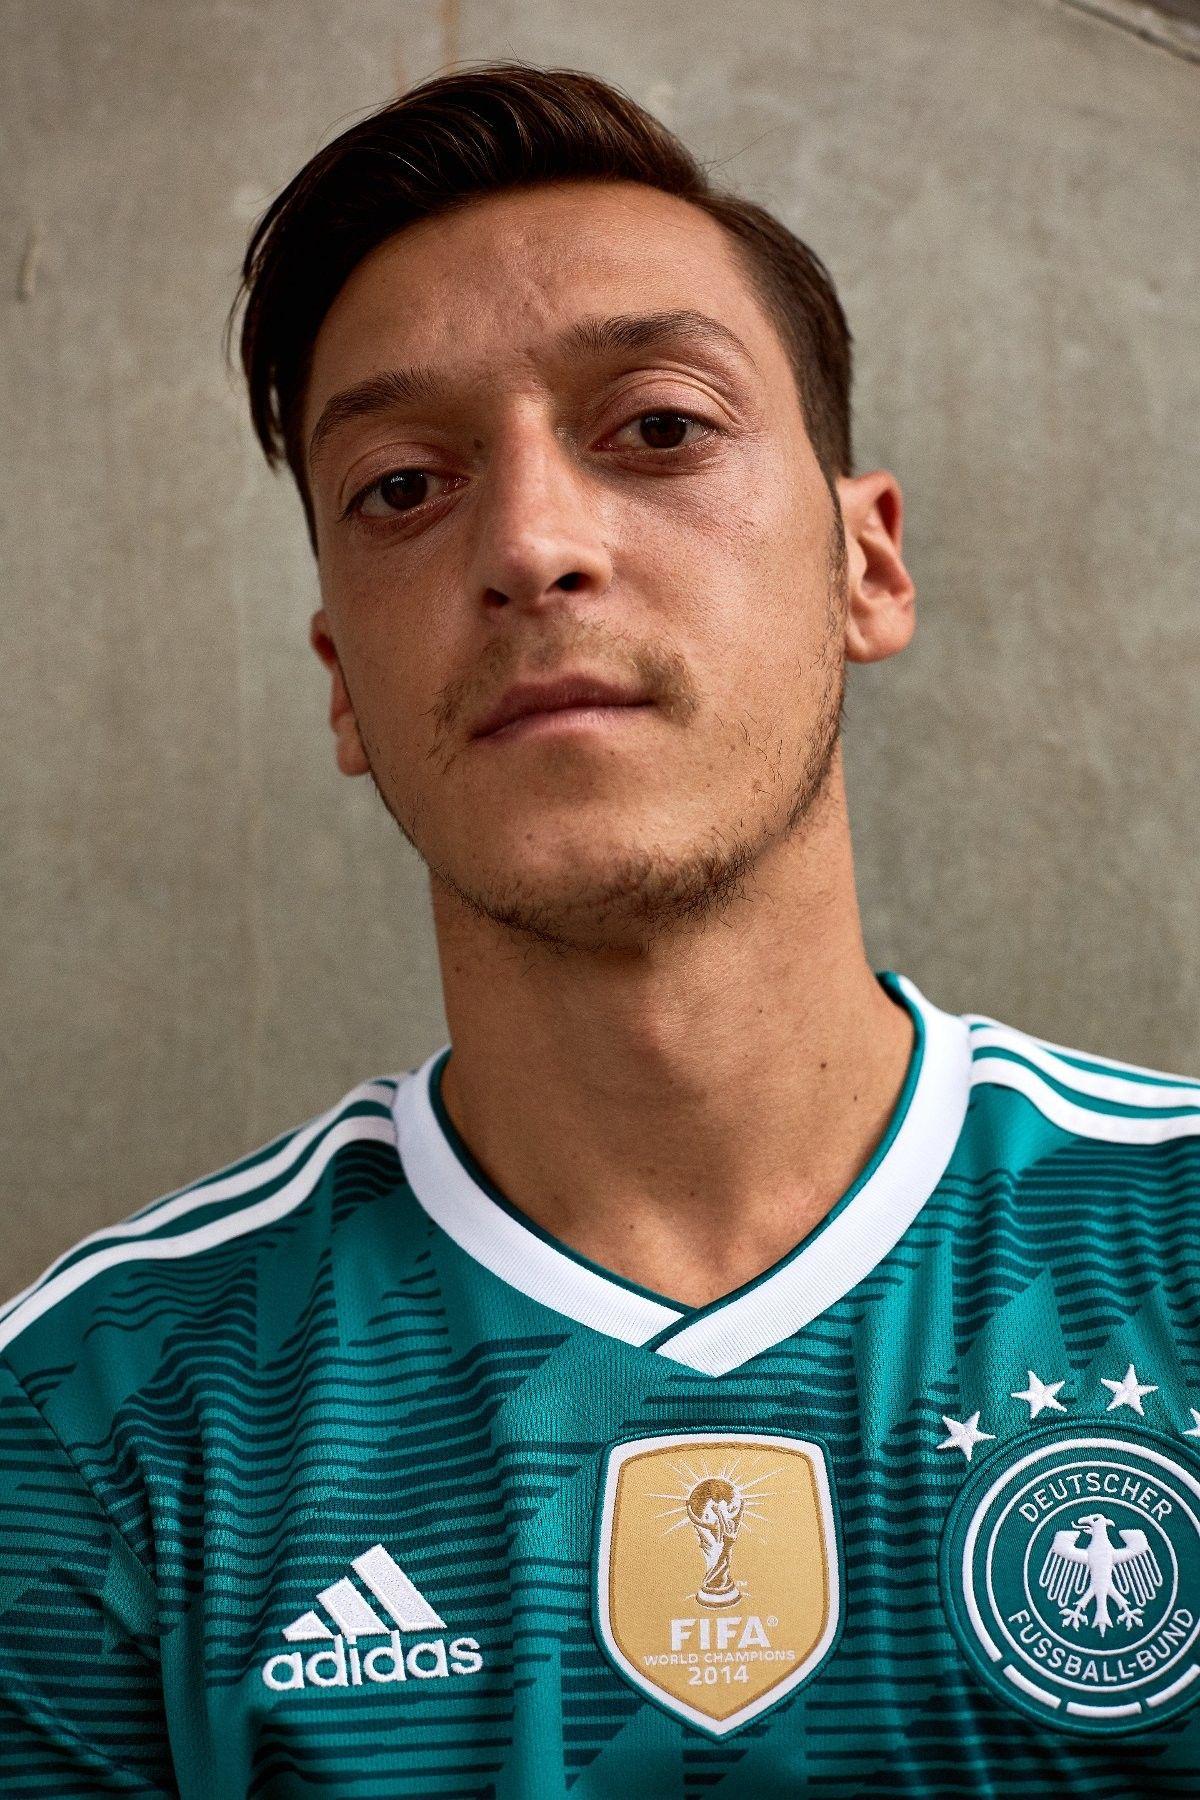 Pin By Jon Roach On Die Mannschaft Football Fashion Mesut Ozil Football